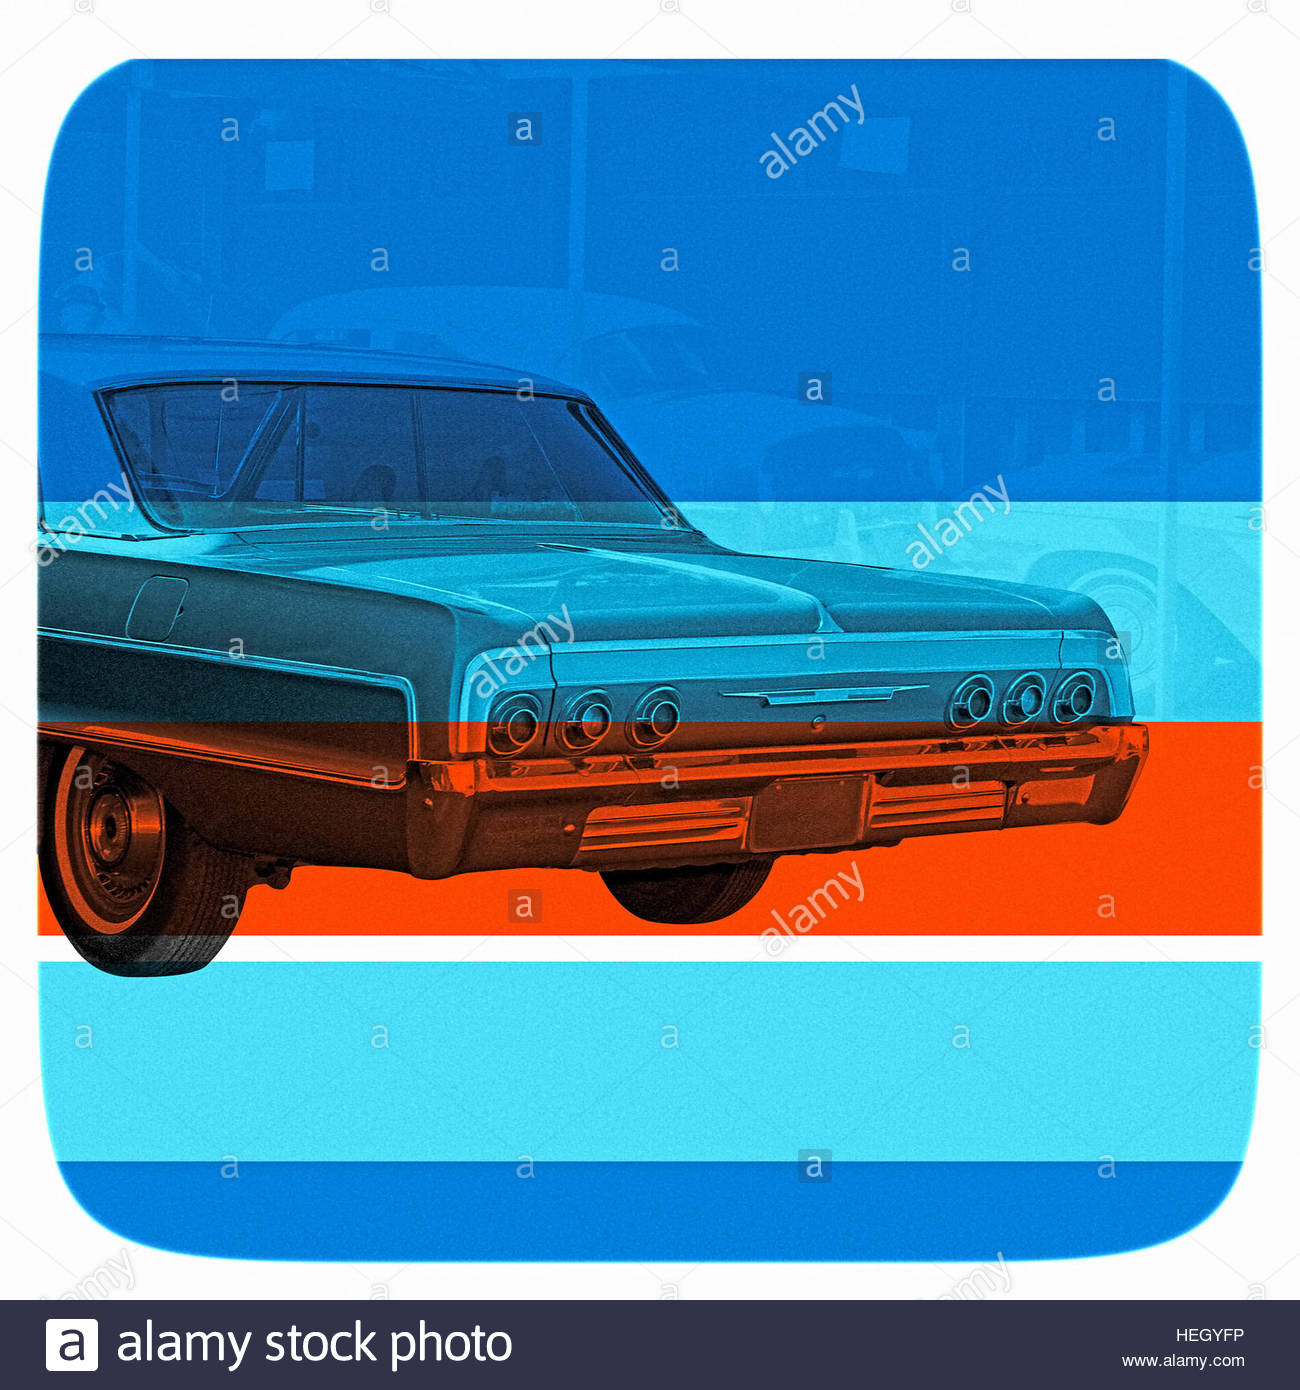 Vintage cool funky car motor vehicle retro American classic cruiser USA ride wheels - Stock Image